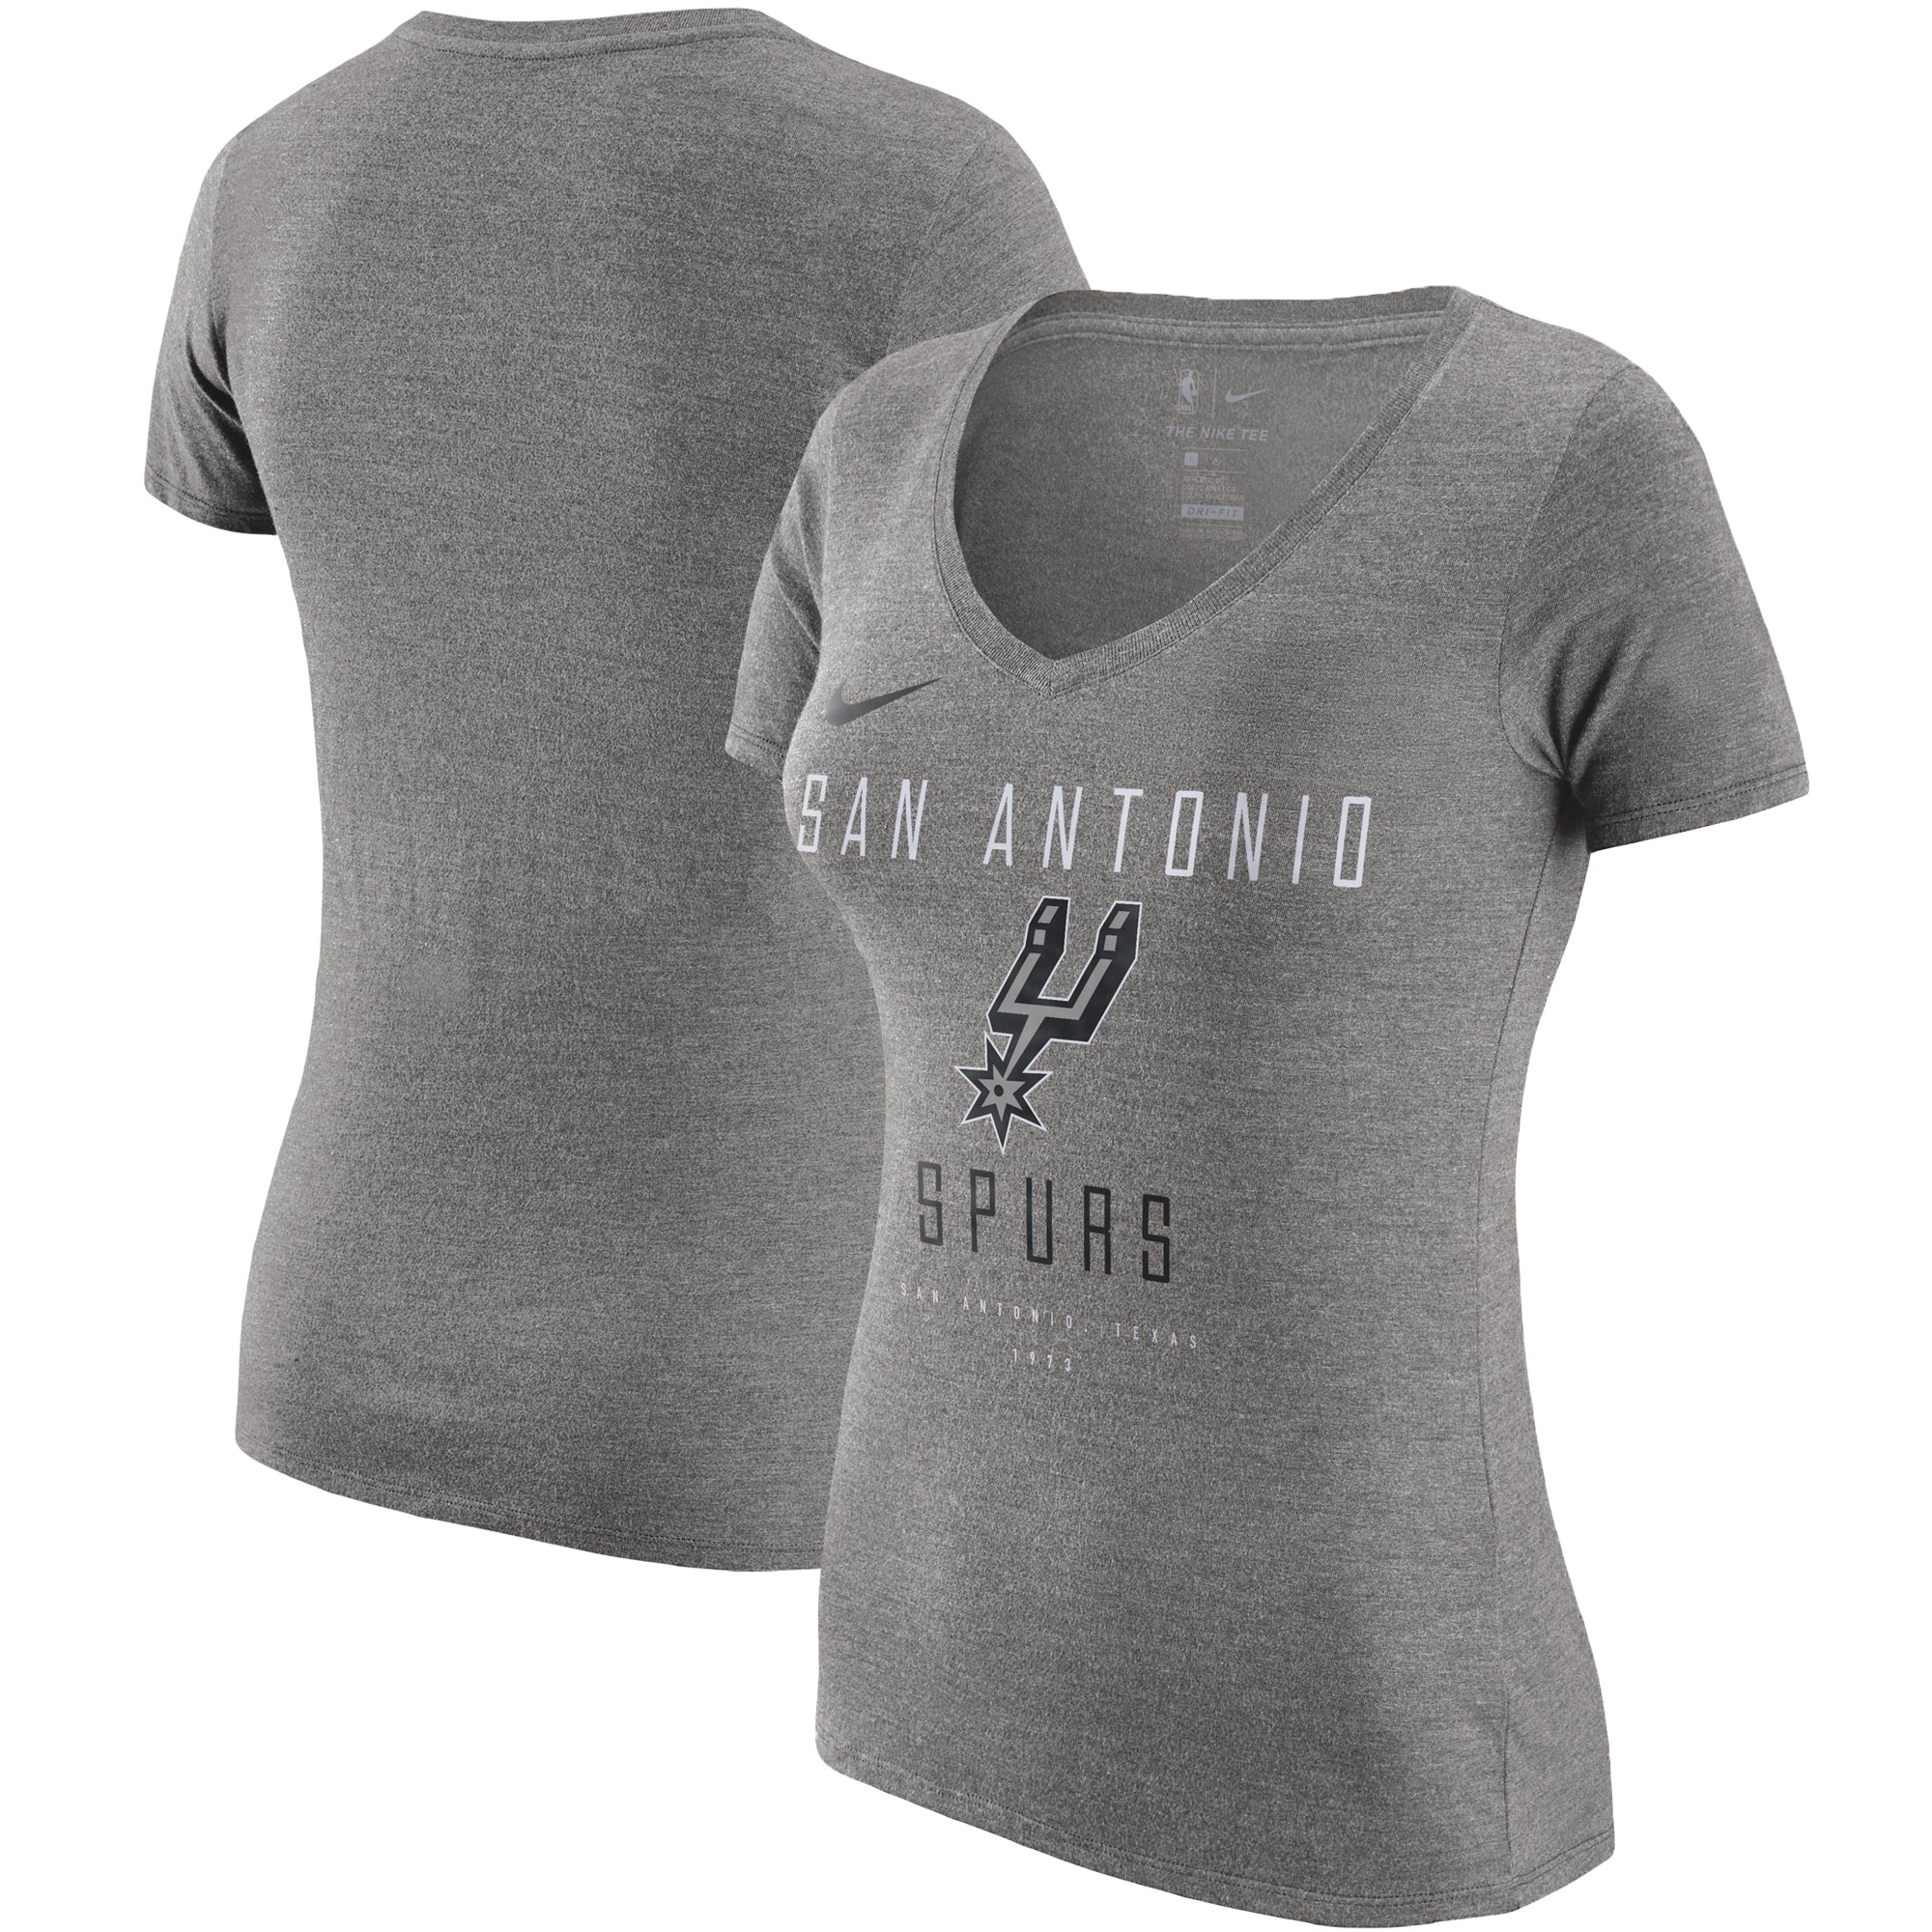 San Antonio Spurs Nike Women's Wordmark Logo Slub Performance V-Neck T-Shirt - Dark Gray